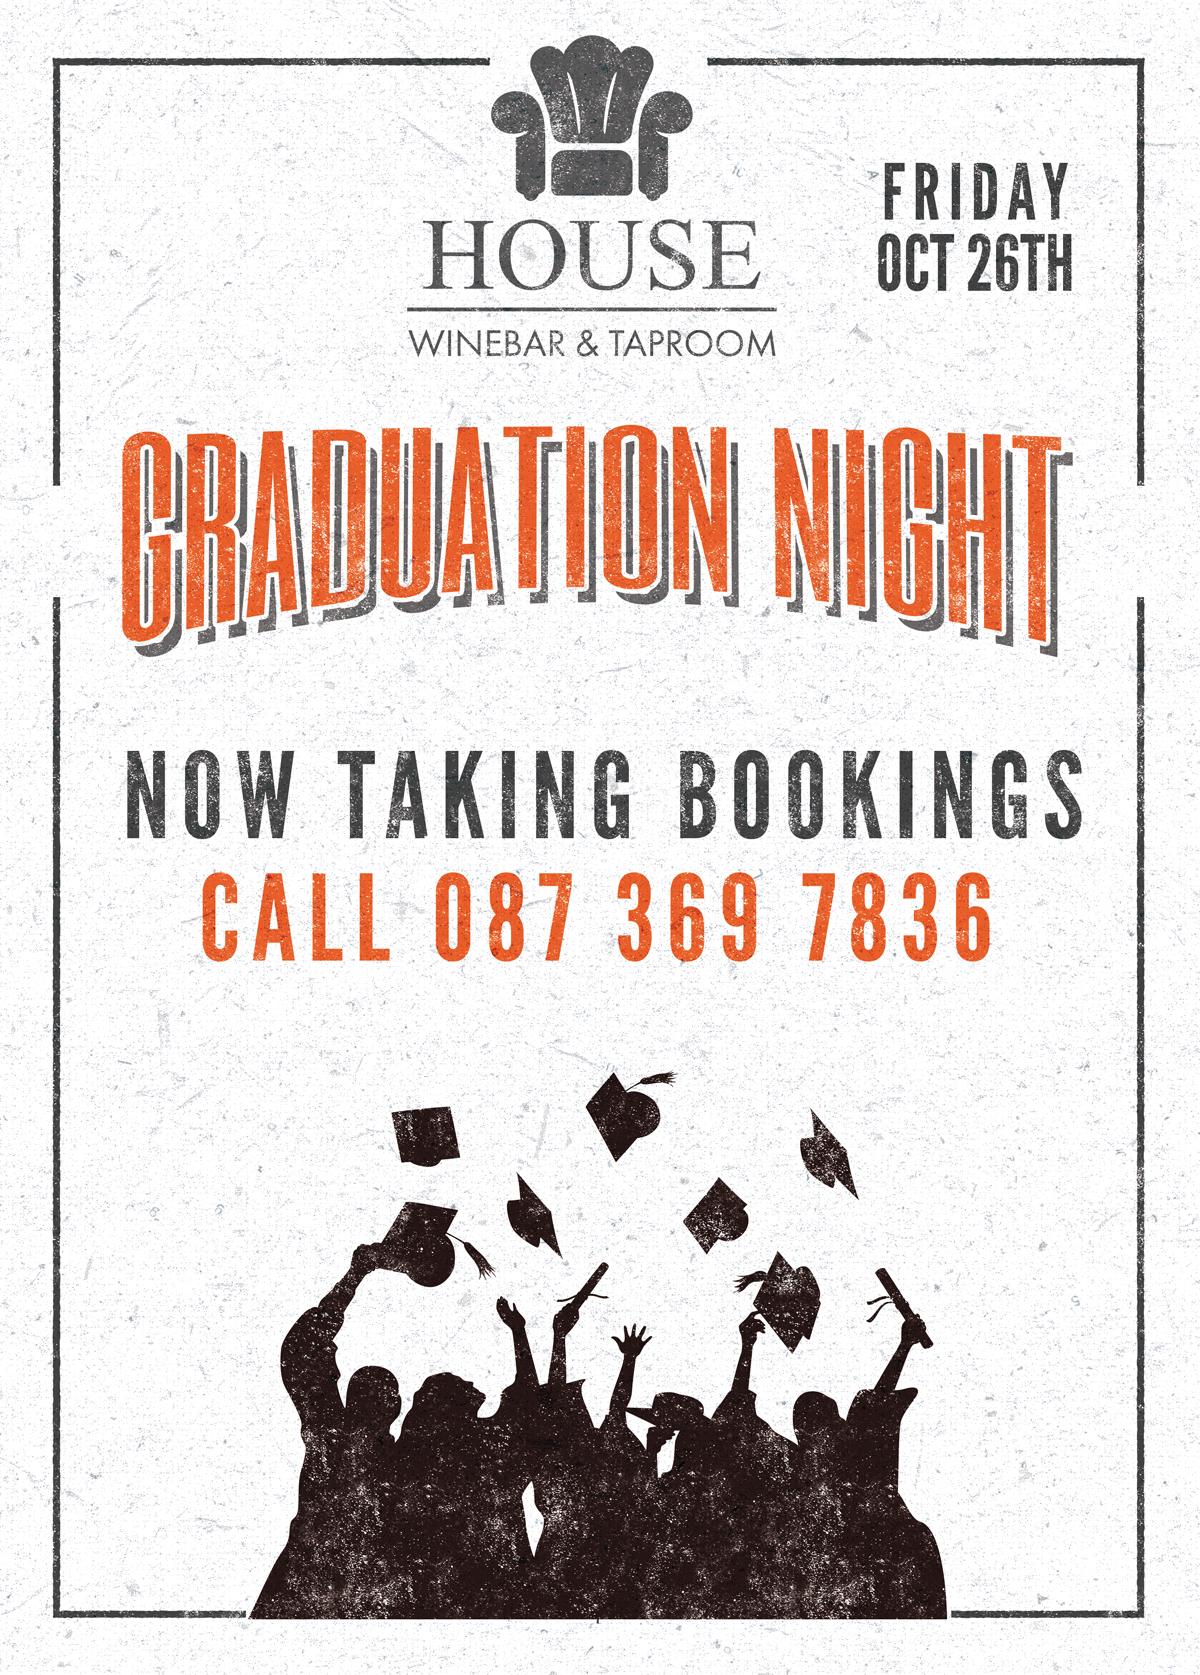 house-gradtiion-now-taking-bookings-2018.jpg